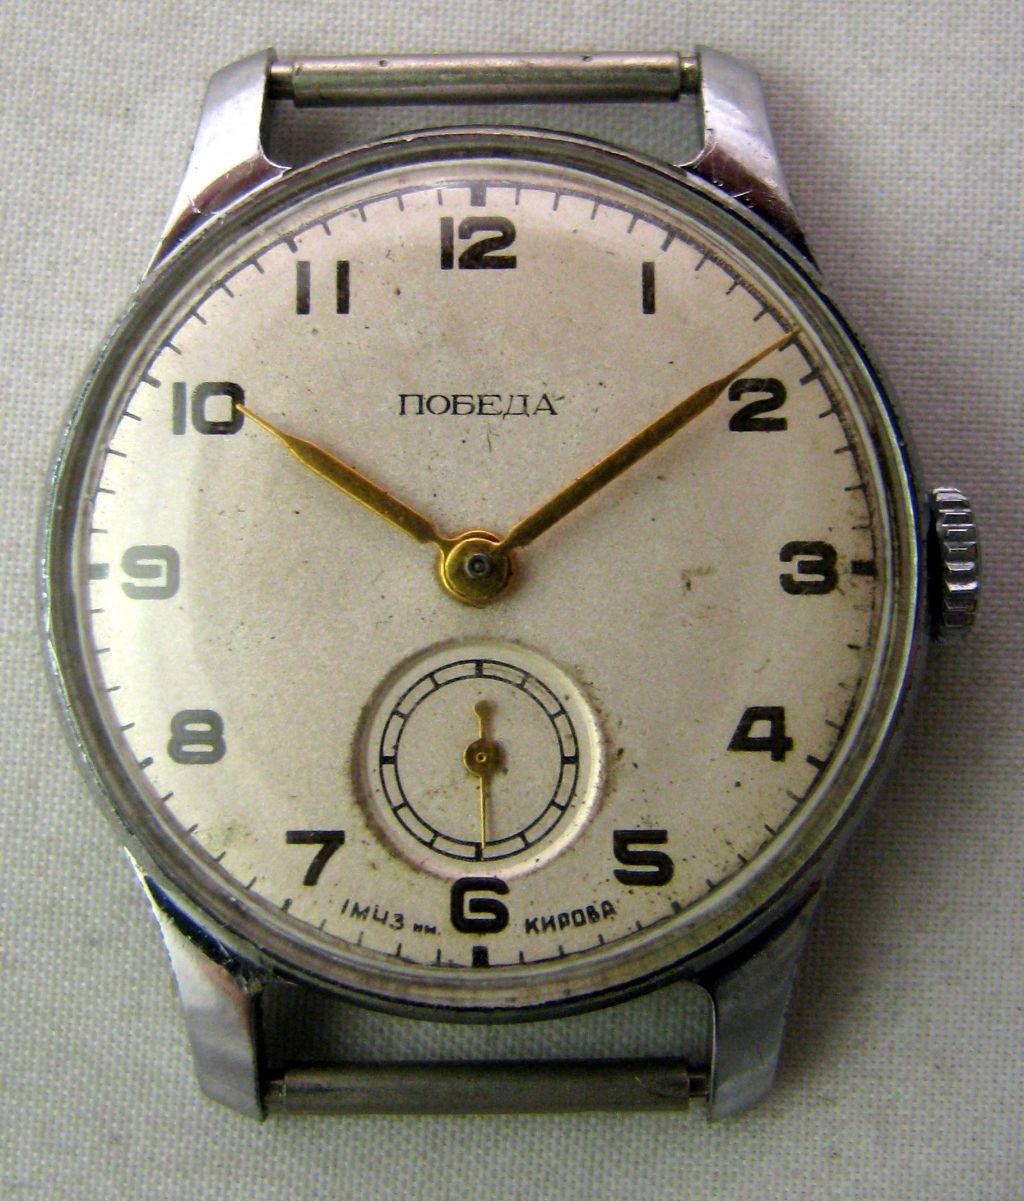 Soviet mechanical watch Pobeda 1MWF Kirova USSR 1951